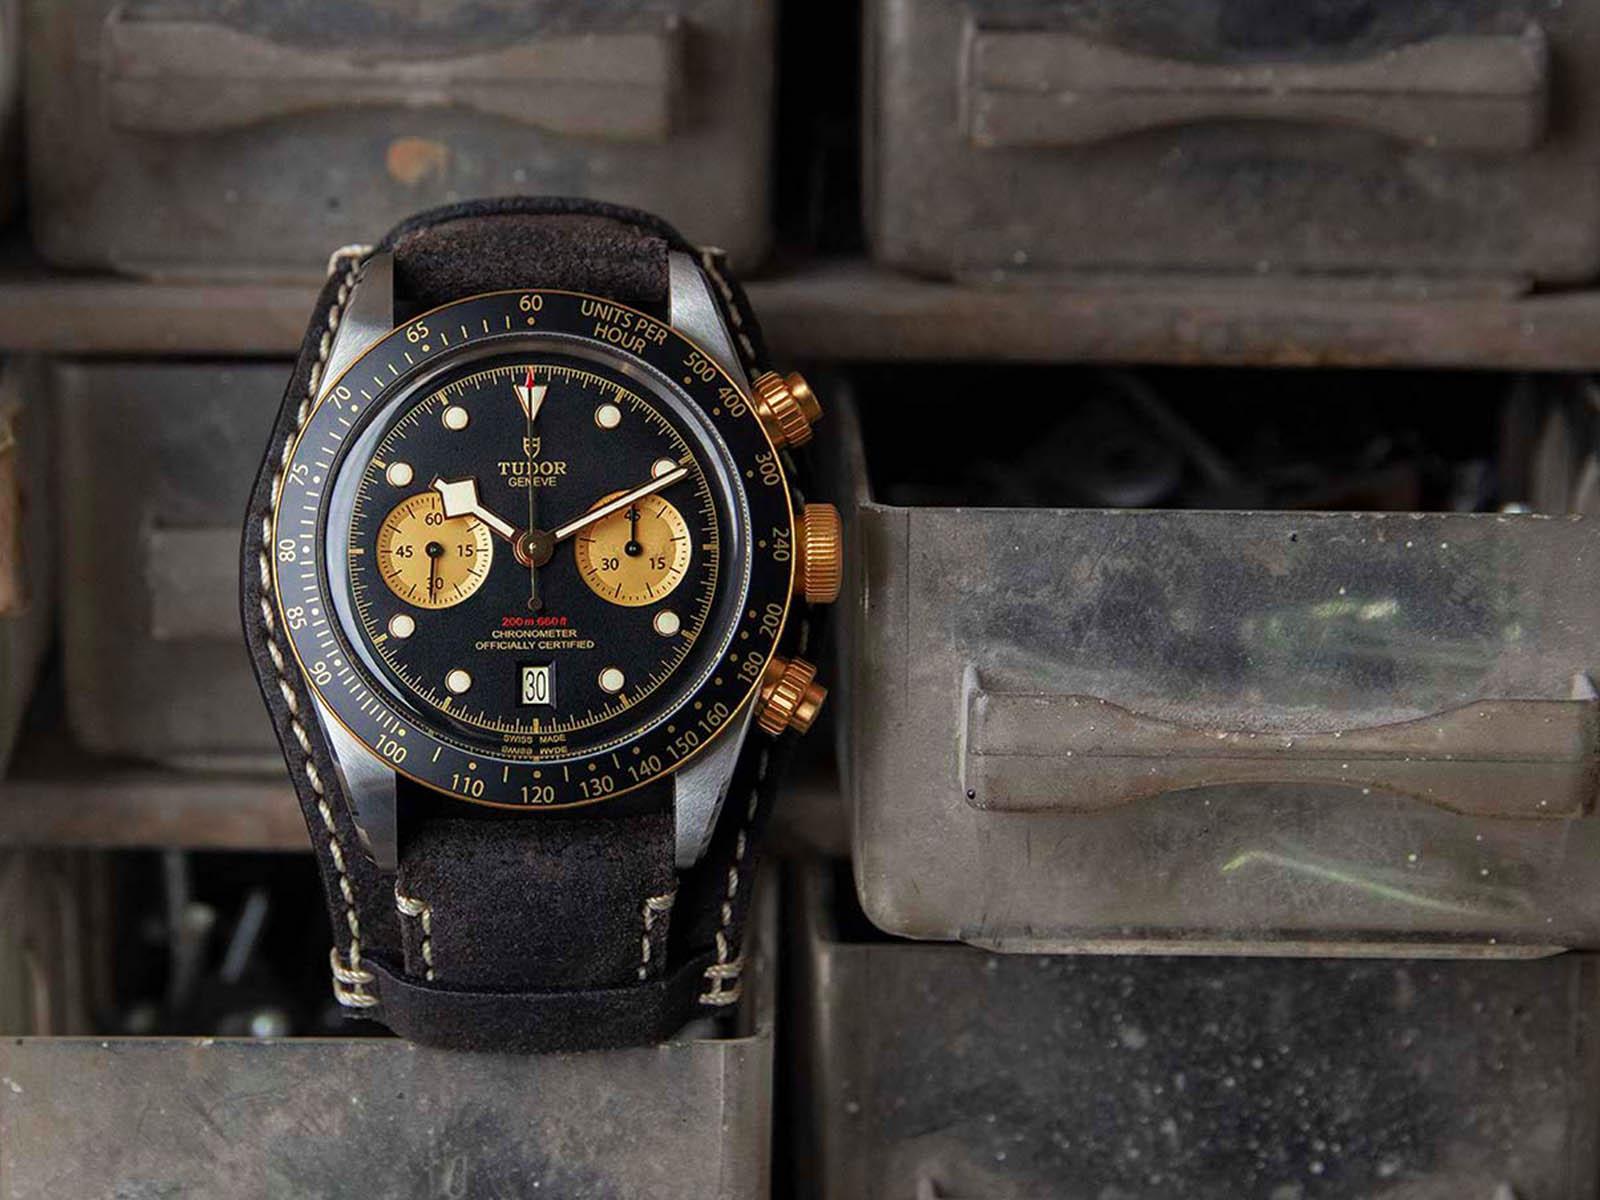 Tudor Black Bay Chrono S&G, Black Bay two-tone, Black Bay steel gold, Black Bay Chrono S&G, MT5813, Tudor MT5813